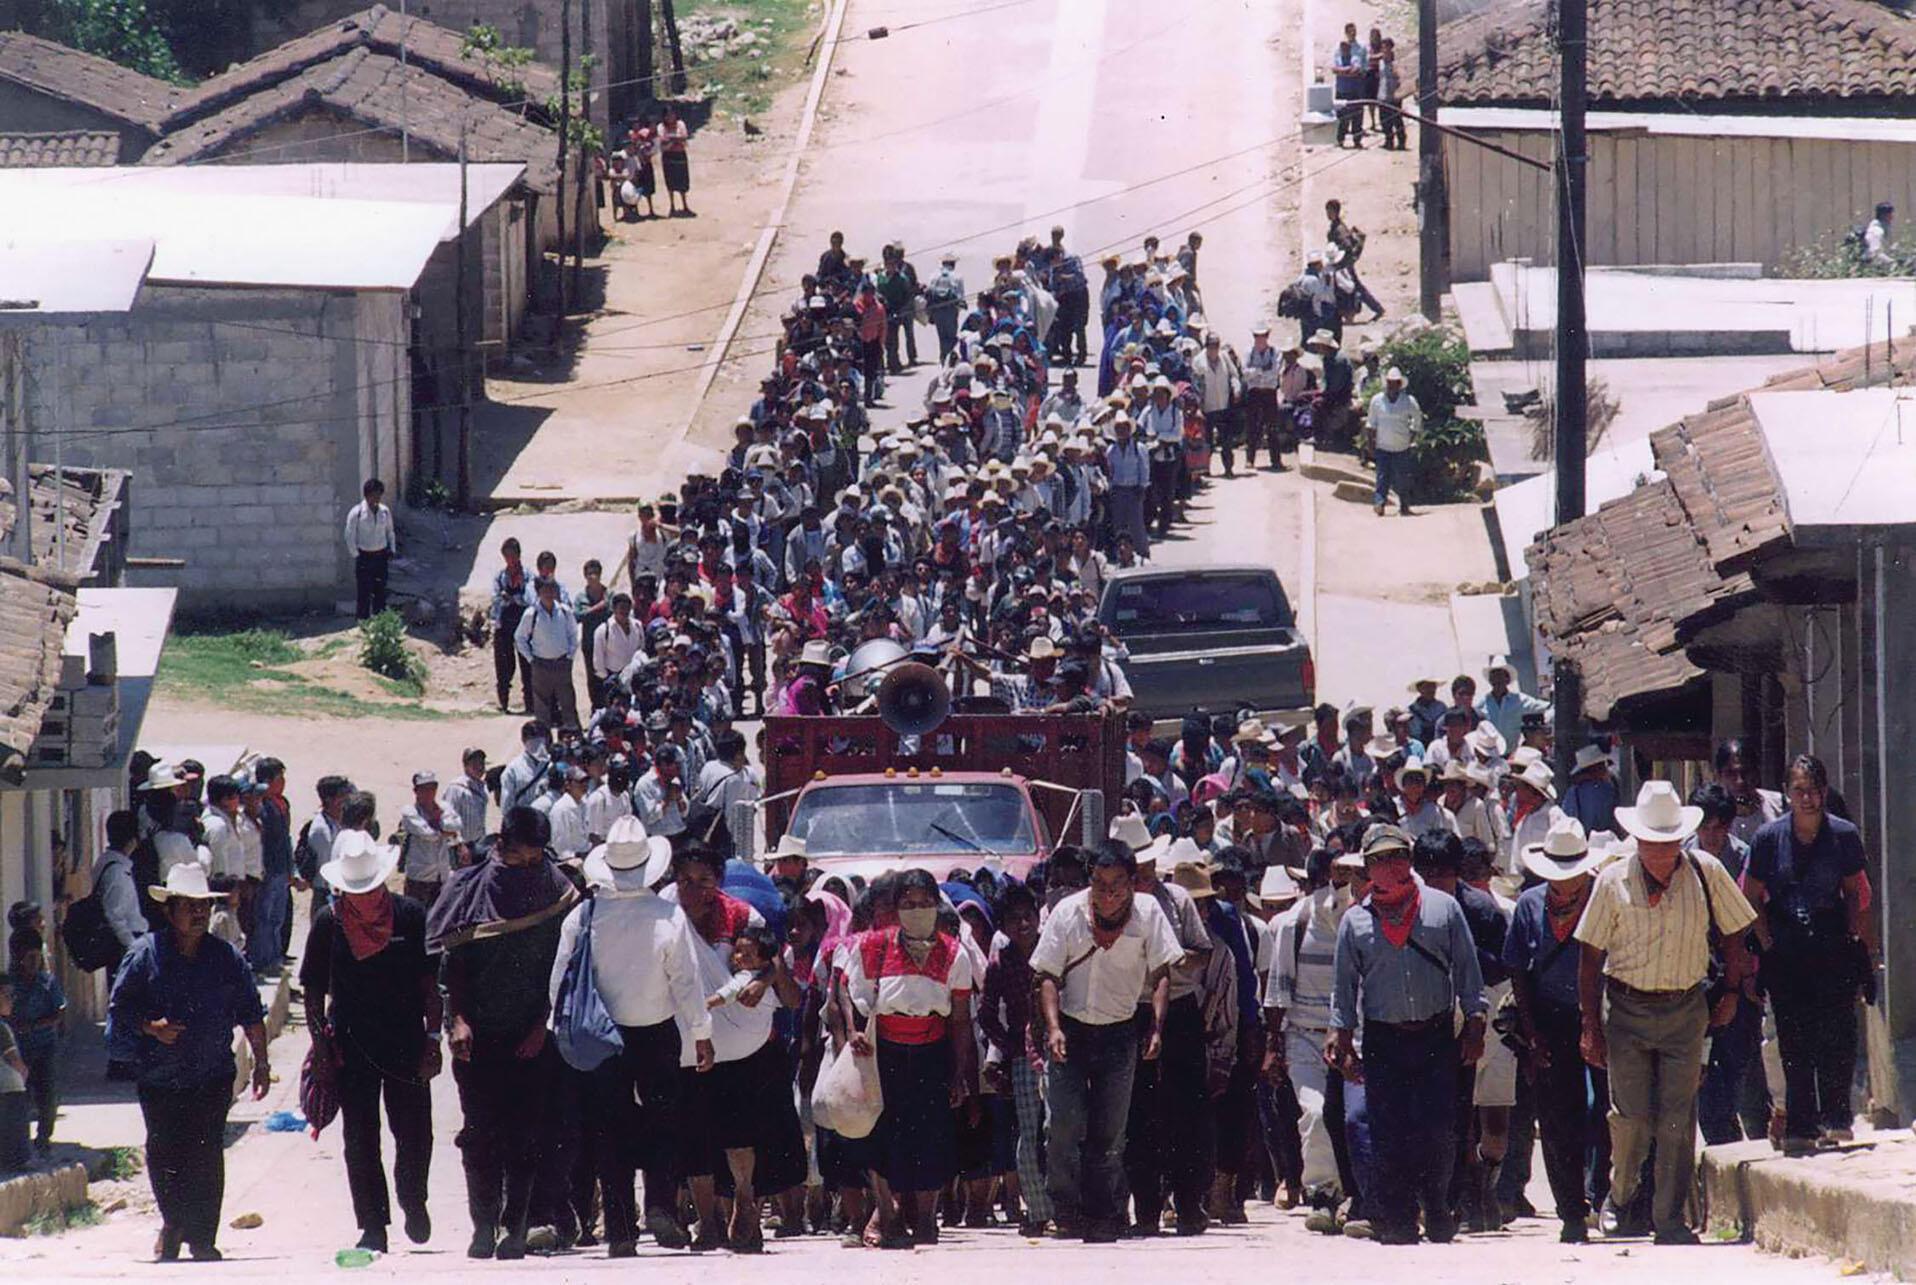 A march by Zapatistas in Chiapas, 1999. (Photo by César Bojórquez.)